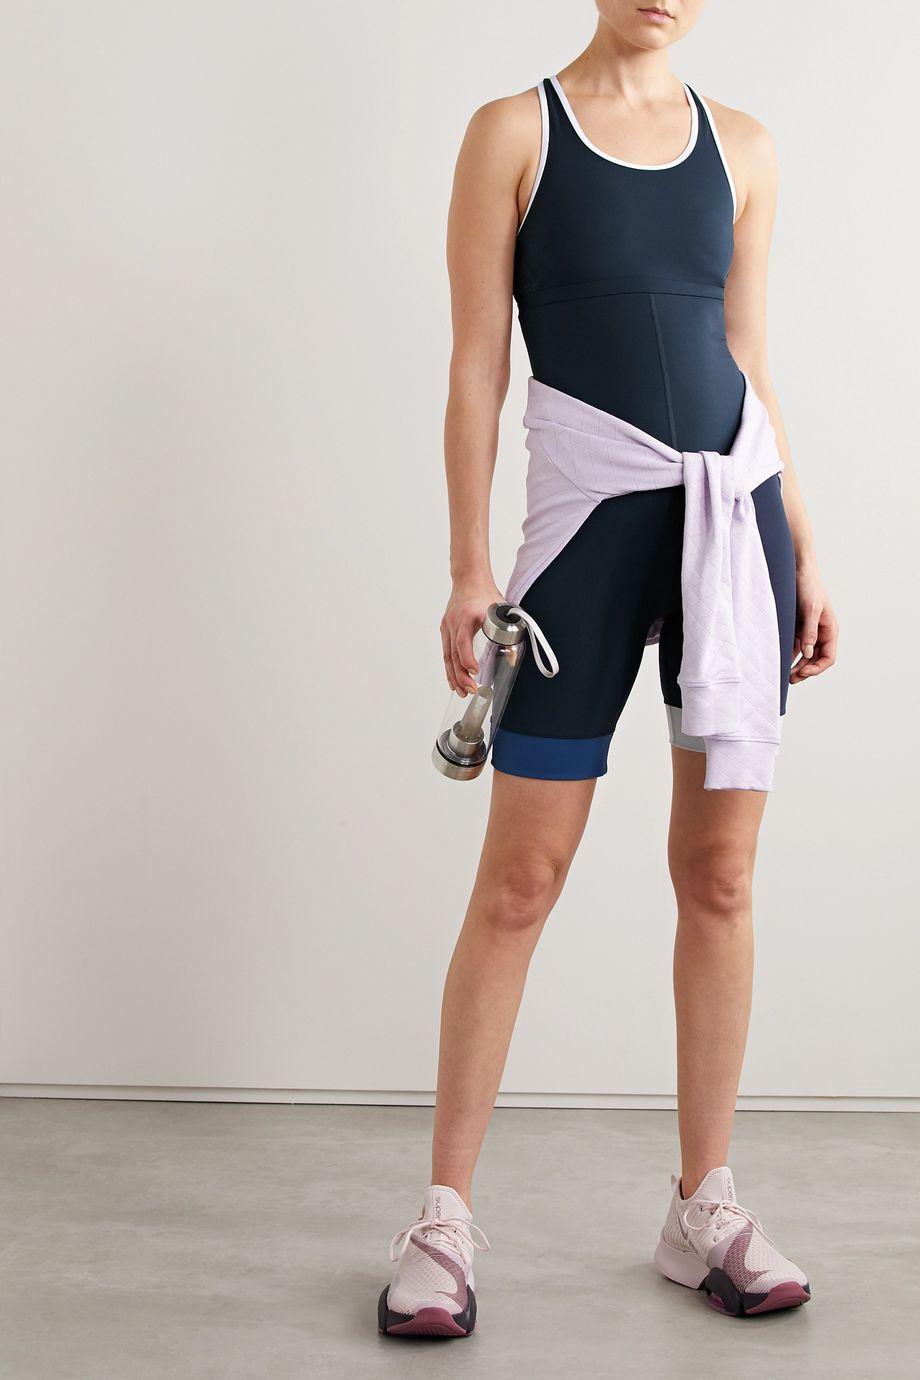 The Upside Joni Gymnastikanzug aus Stretch-Material in Colour-Block-Optik